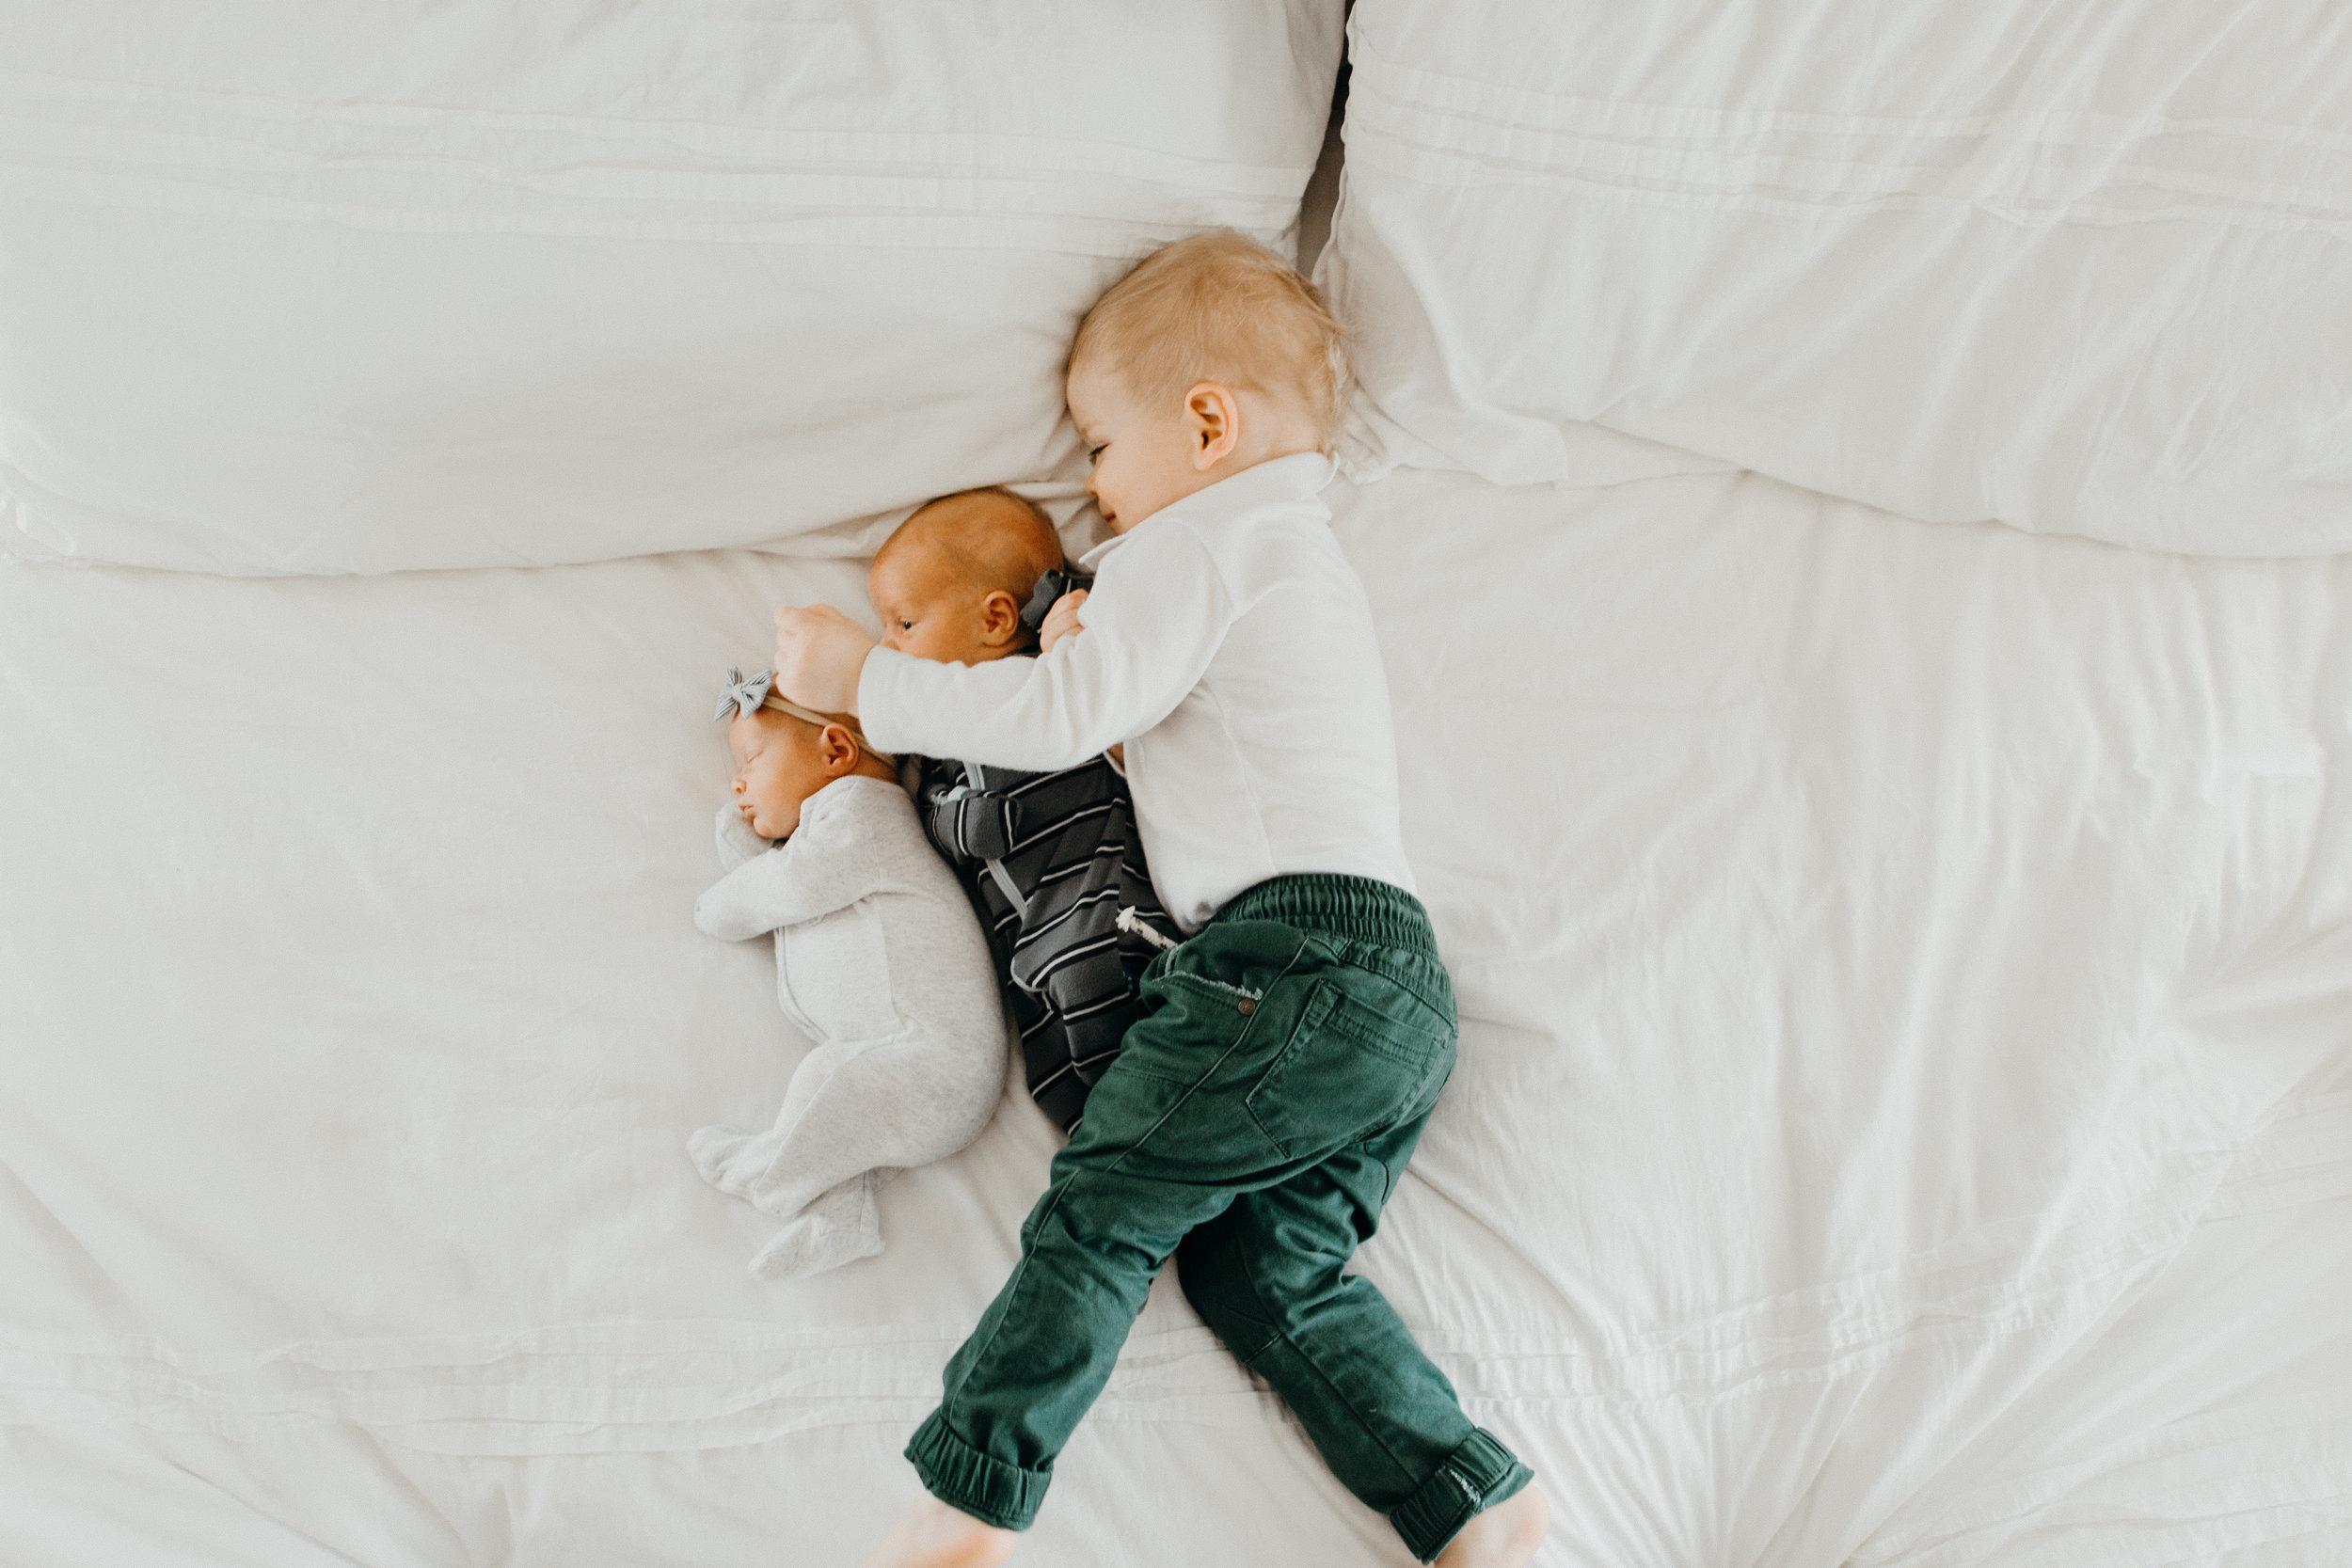 jamieleighmiller_inhome_newborn_photographer_omahanebraska-12.jpg